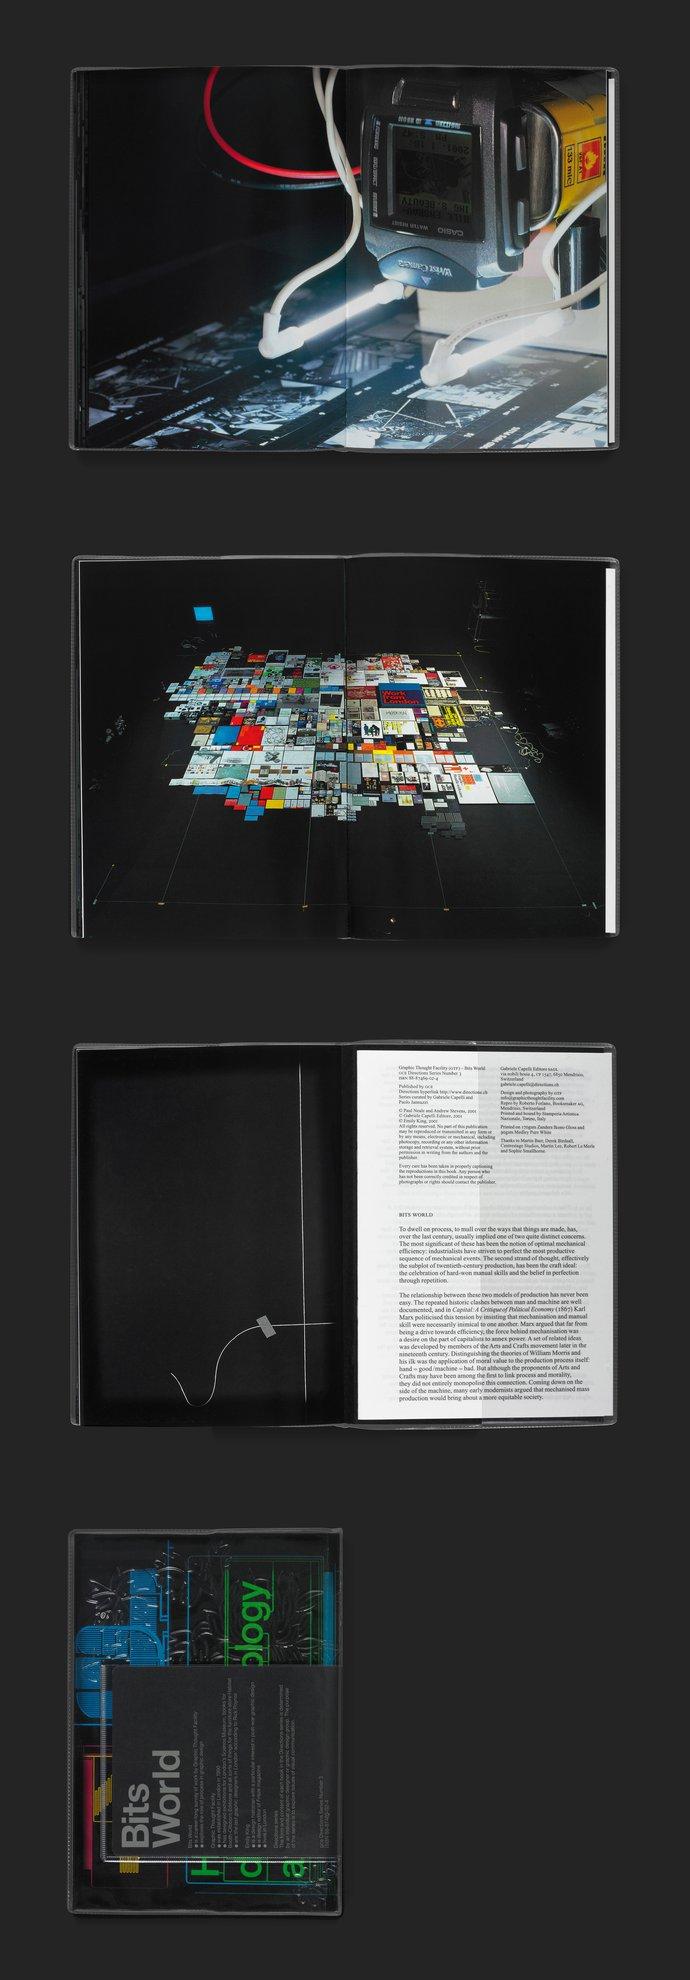 Gabrielle Capelli Editions – GTF: Bits World, 2001 (Publication), image 4